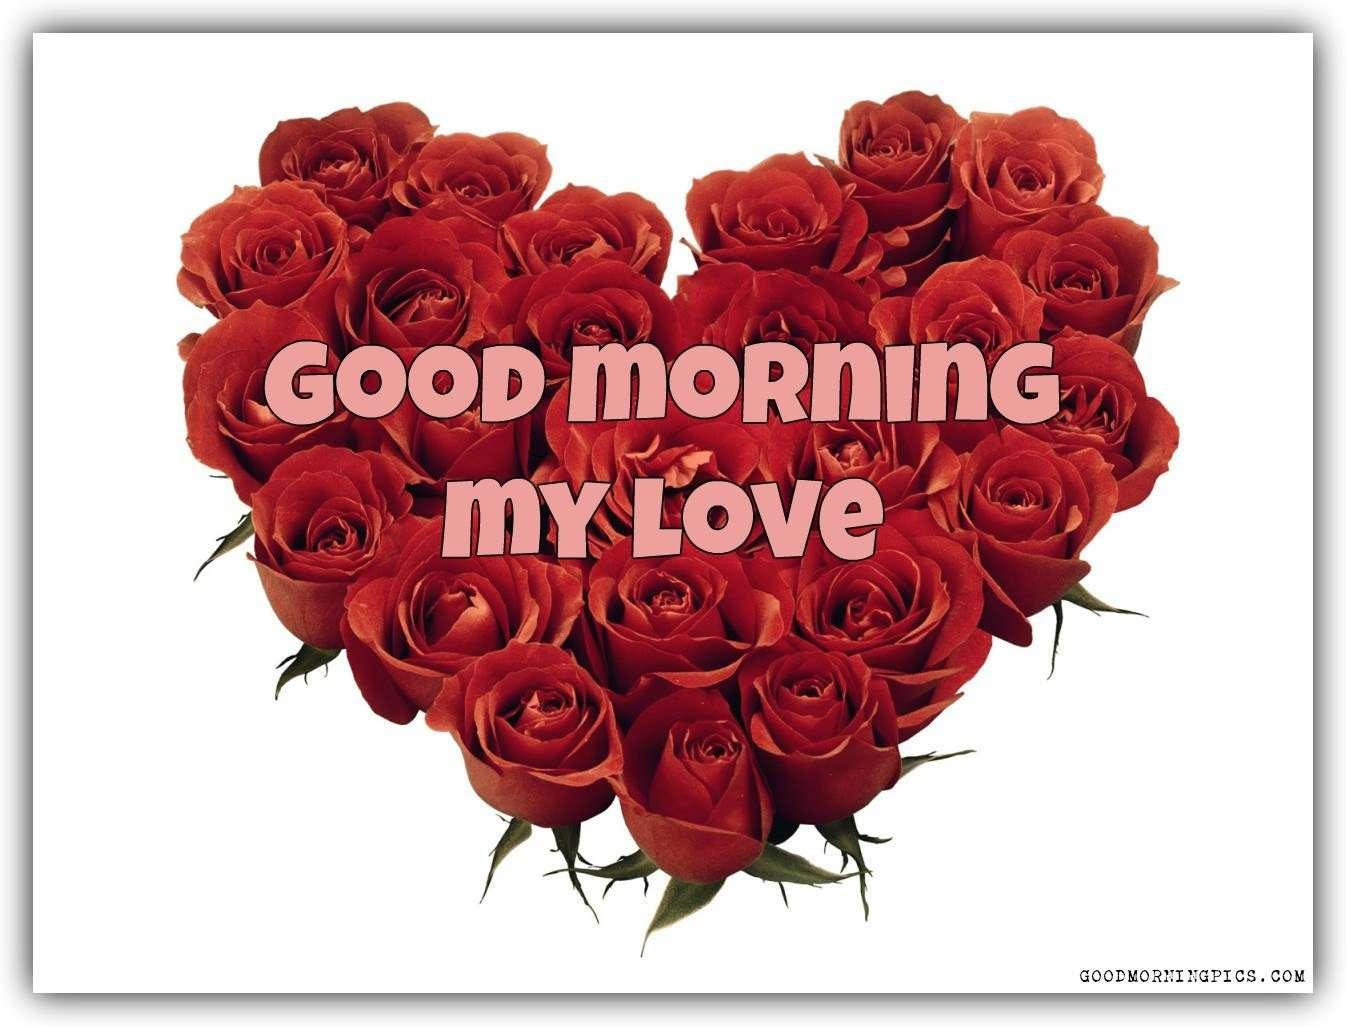 Good Morning My Love Red Roses And Heart Goodmorningpicscom